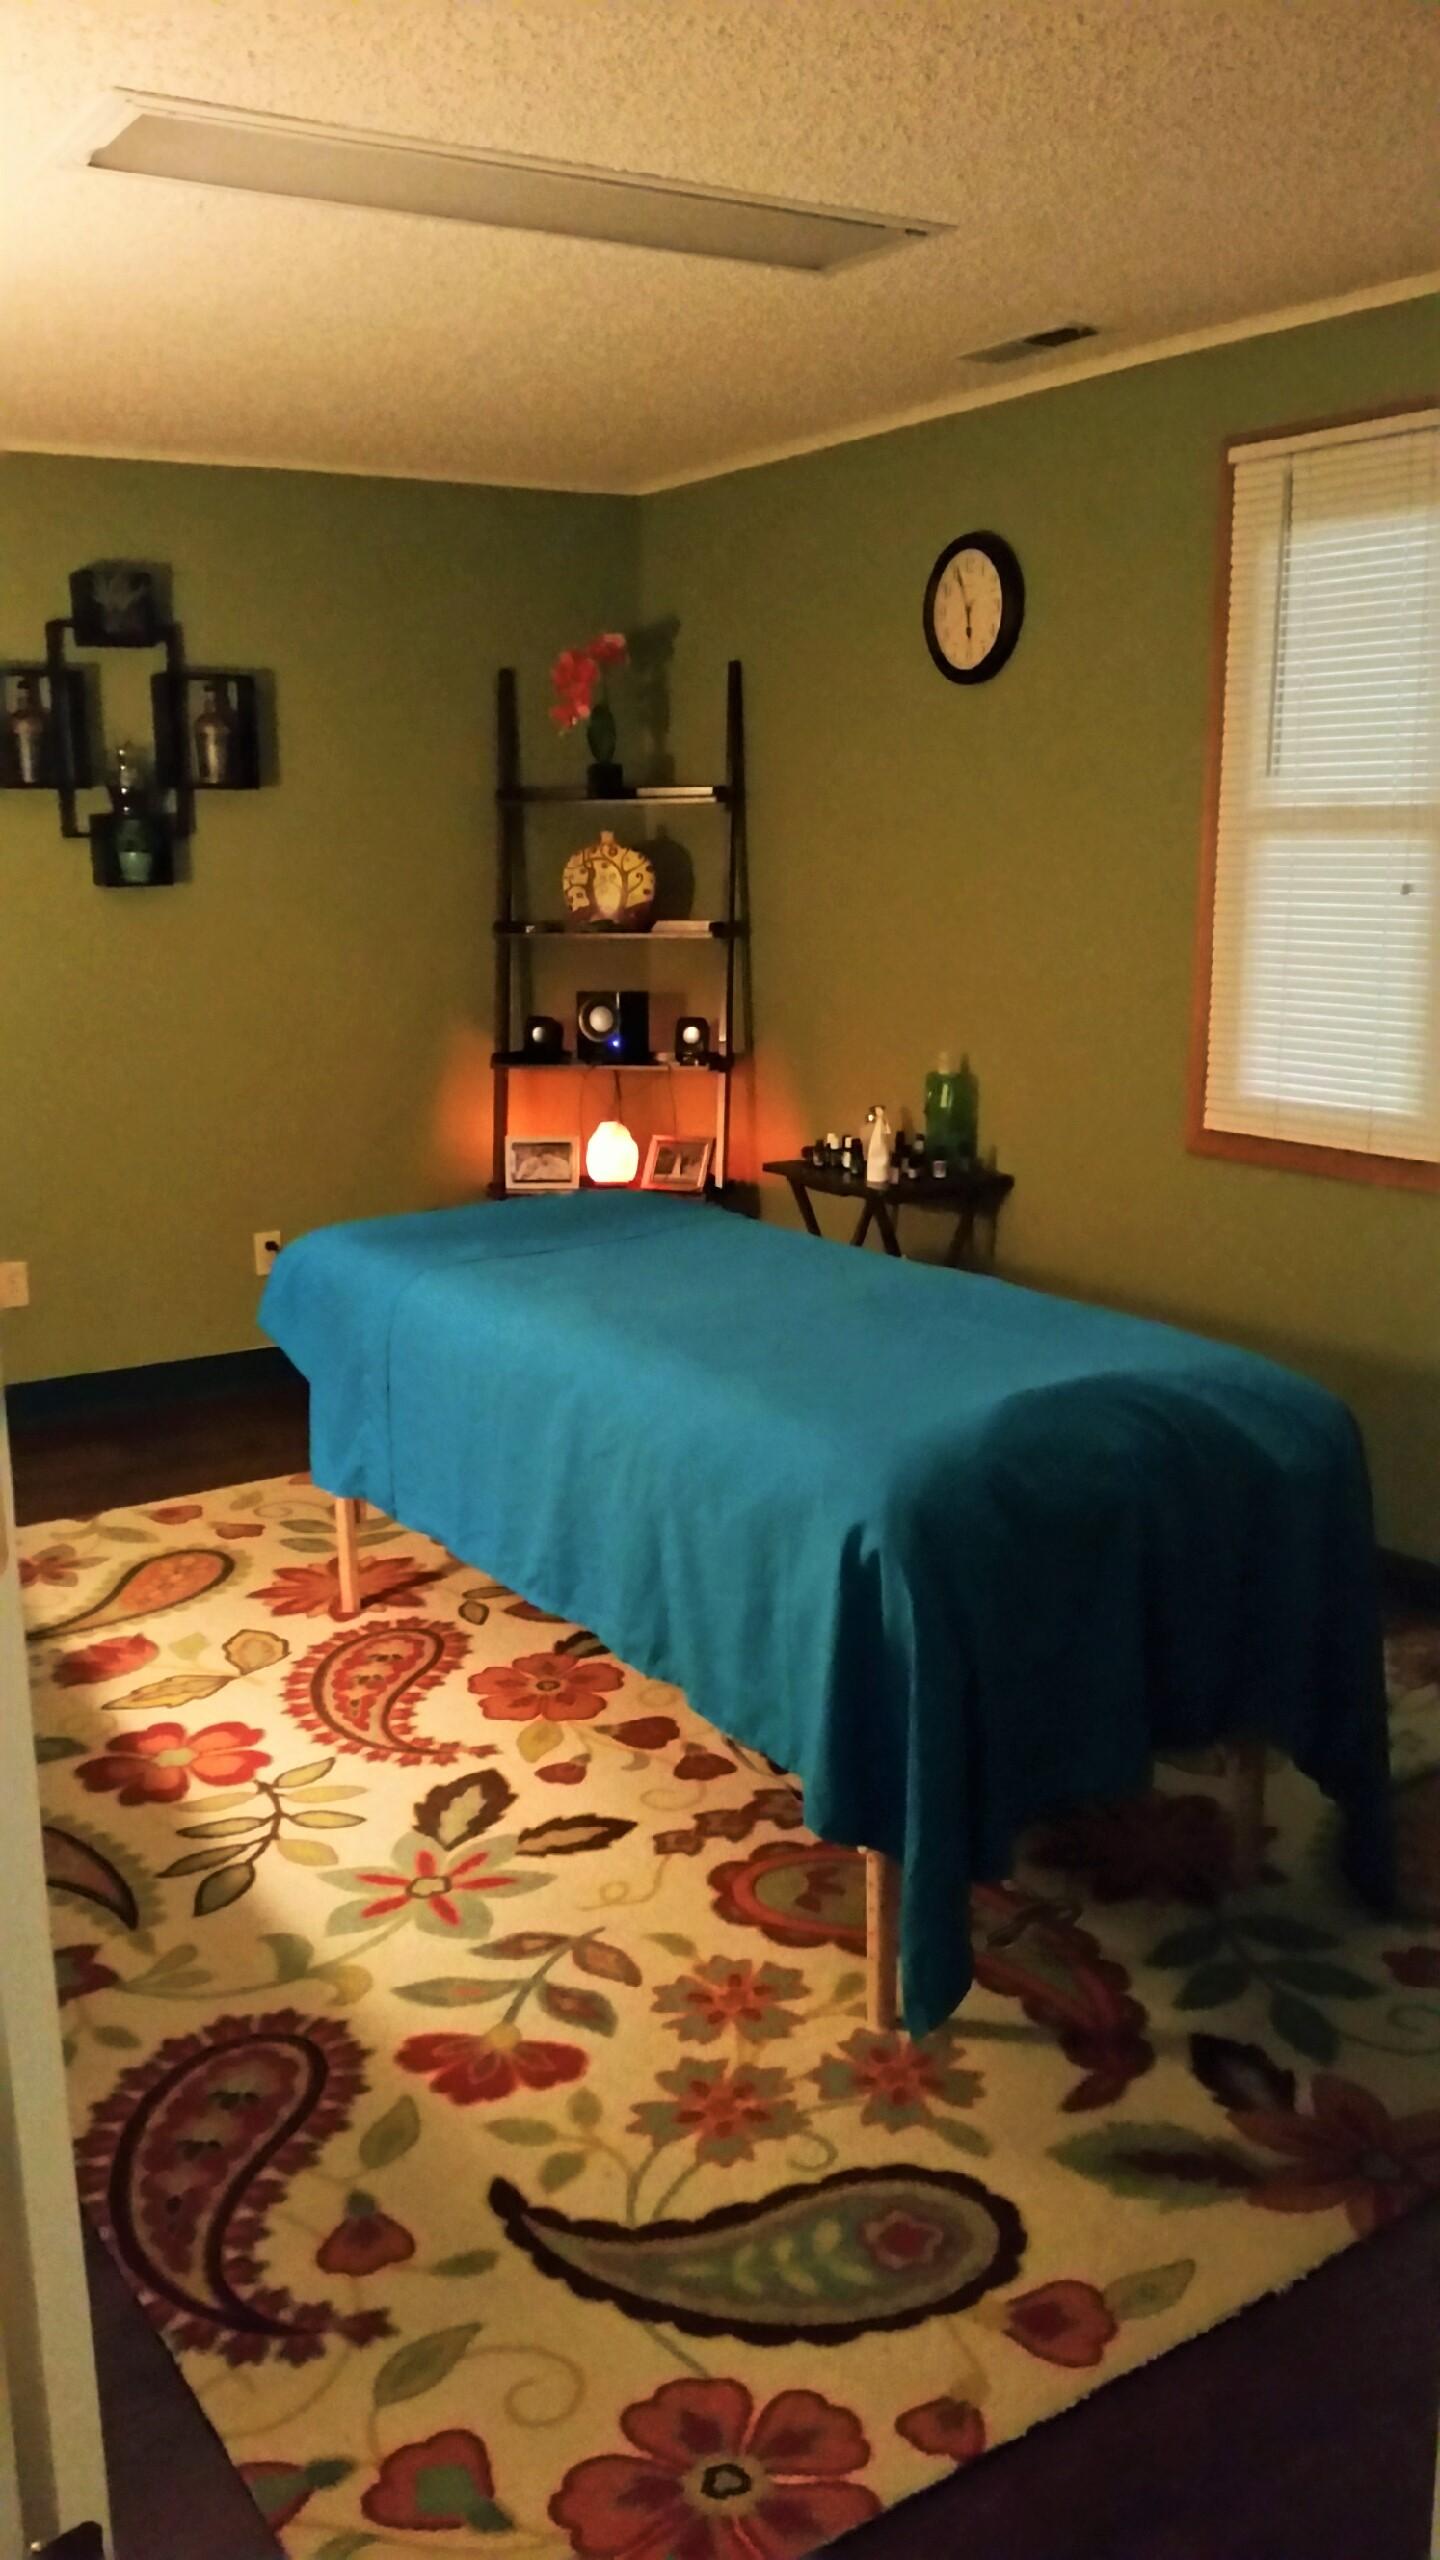 http://healinghaventherapy.com/images/4ecbf1a49646d9f14a1fa95e6ef3cd9f